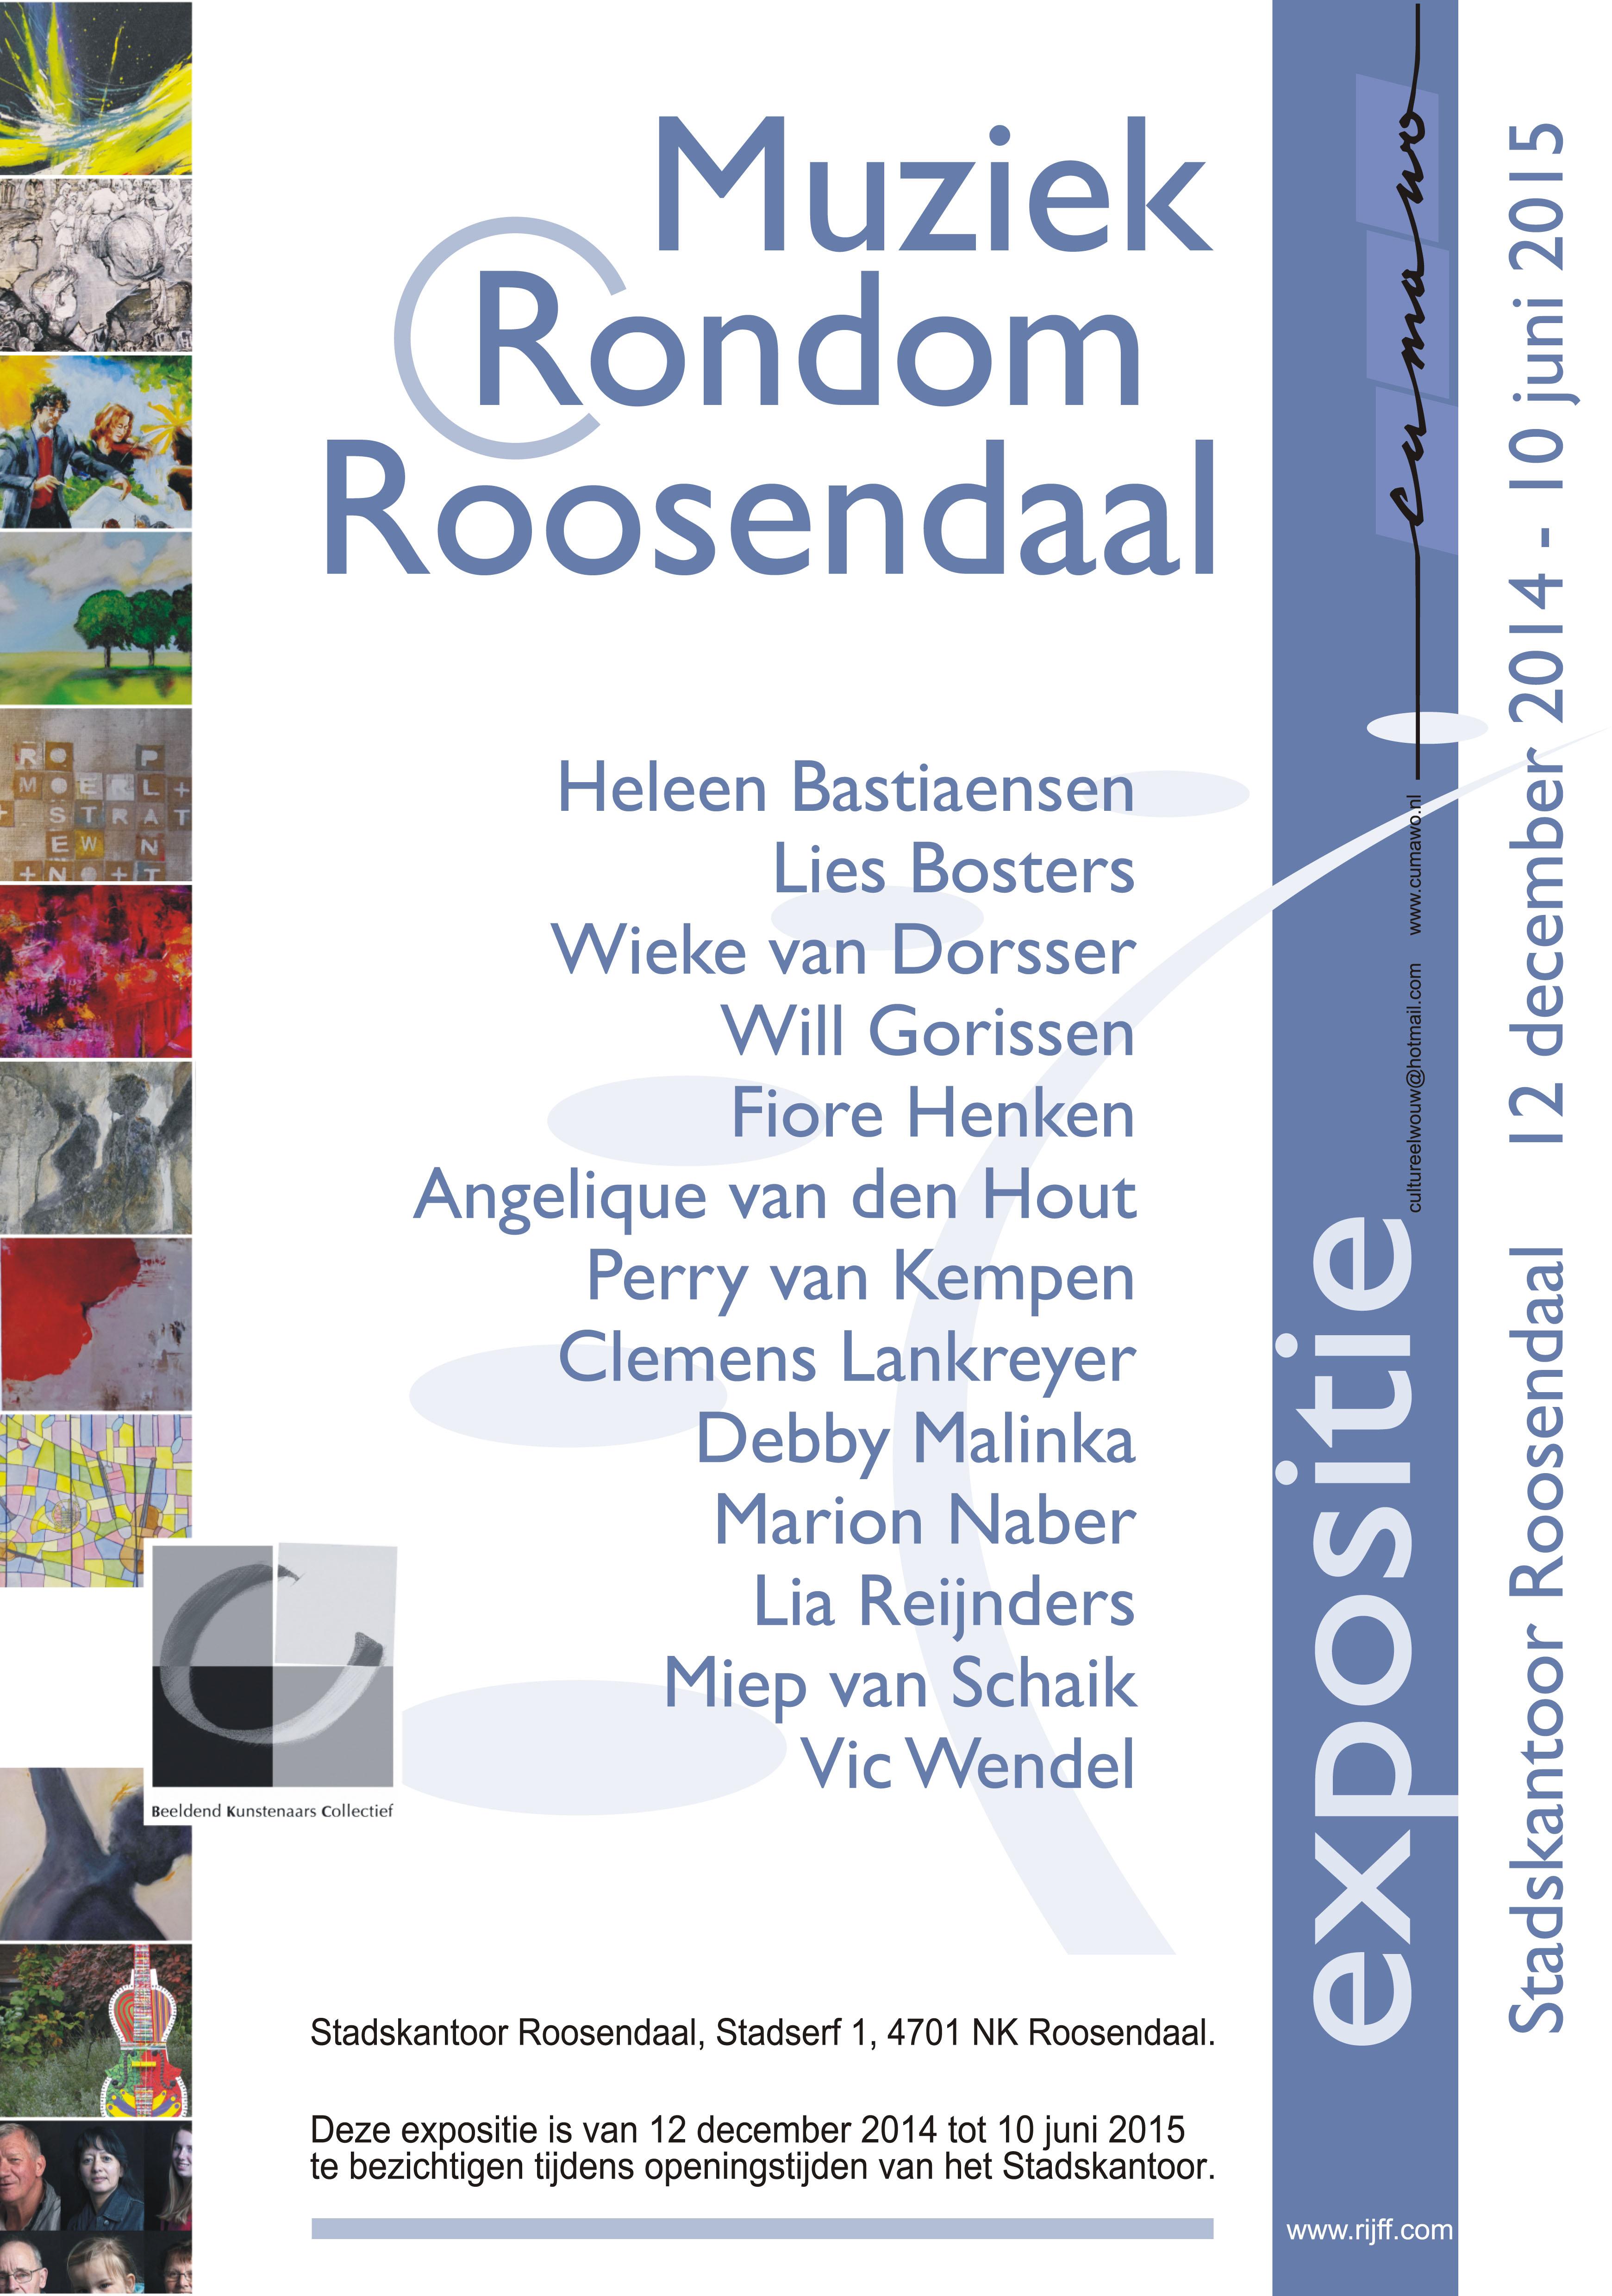 Muziek Rondo(m) Roosendaal